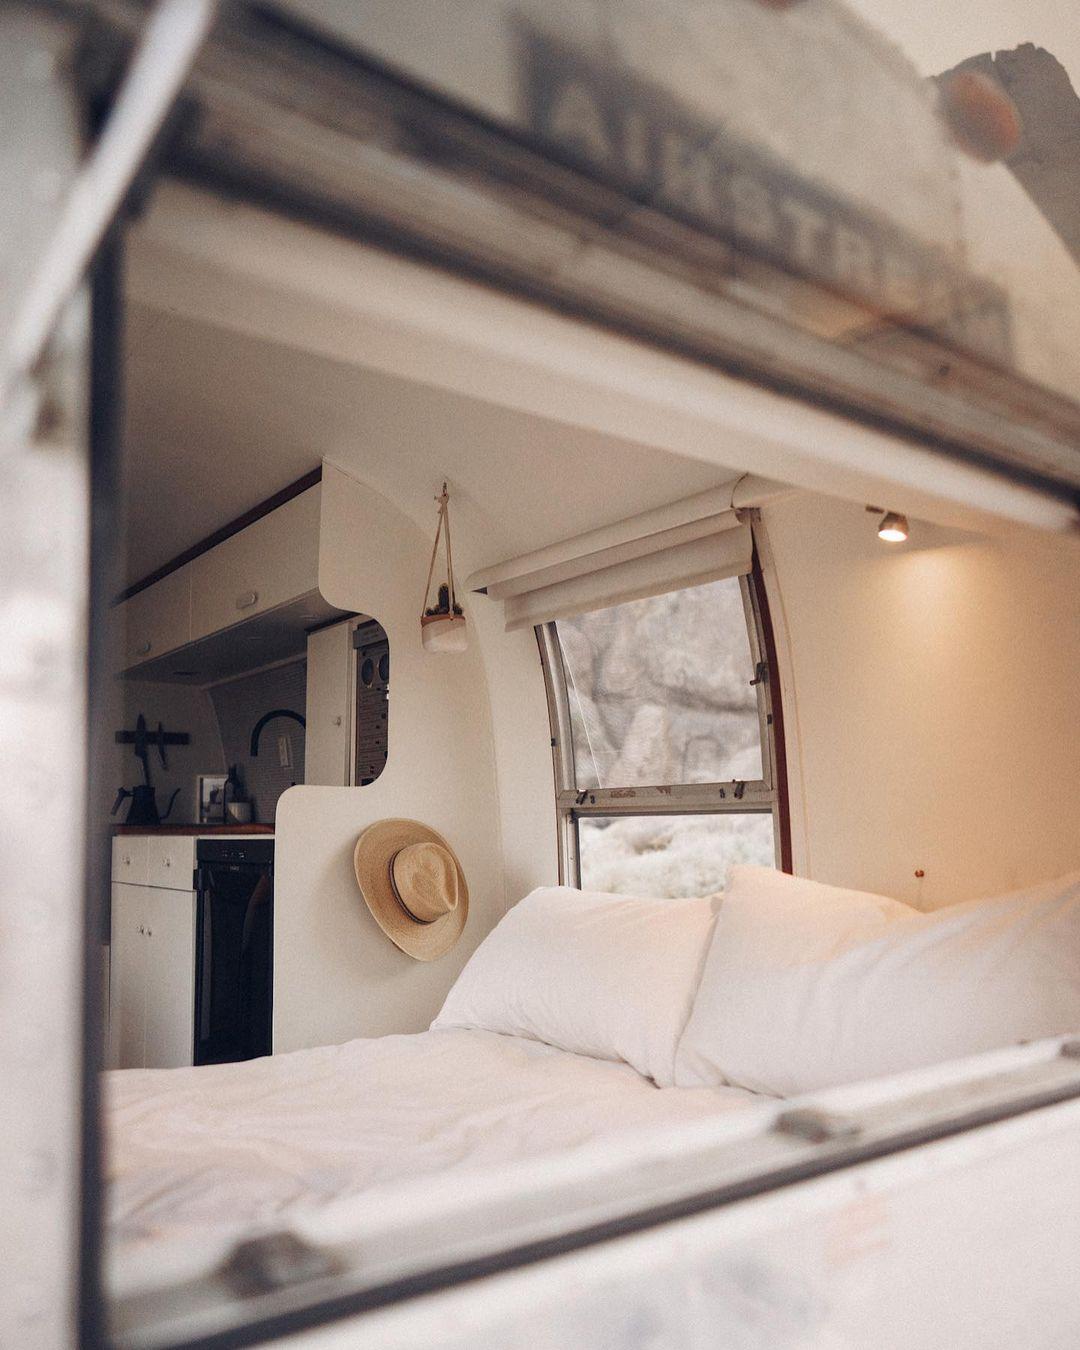 Airstream trailer Haus 20 - Interior designer turned heirloom Airstream into delightful home